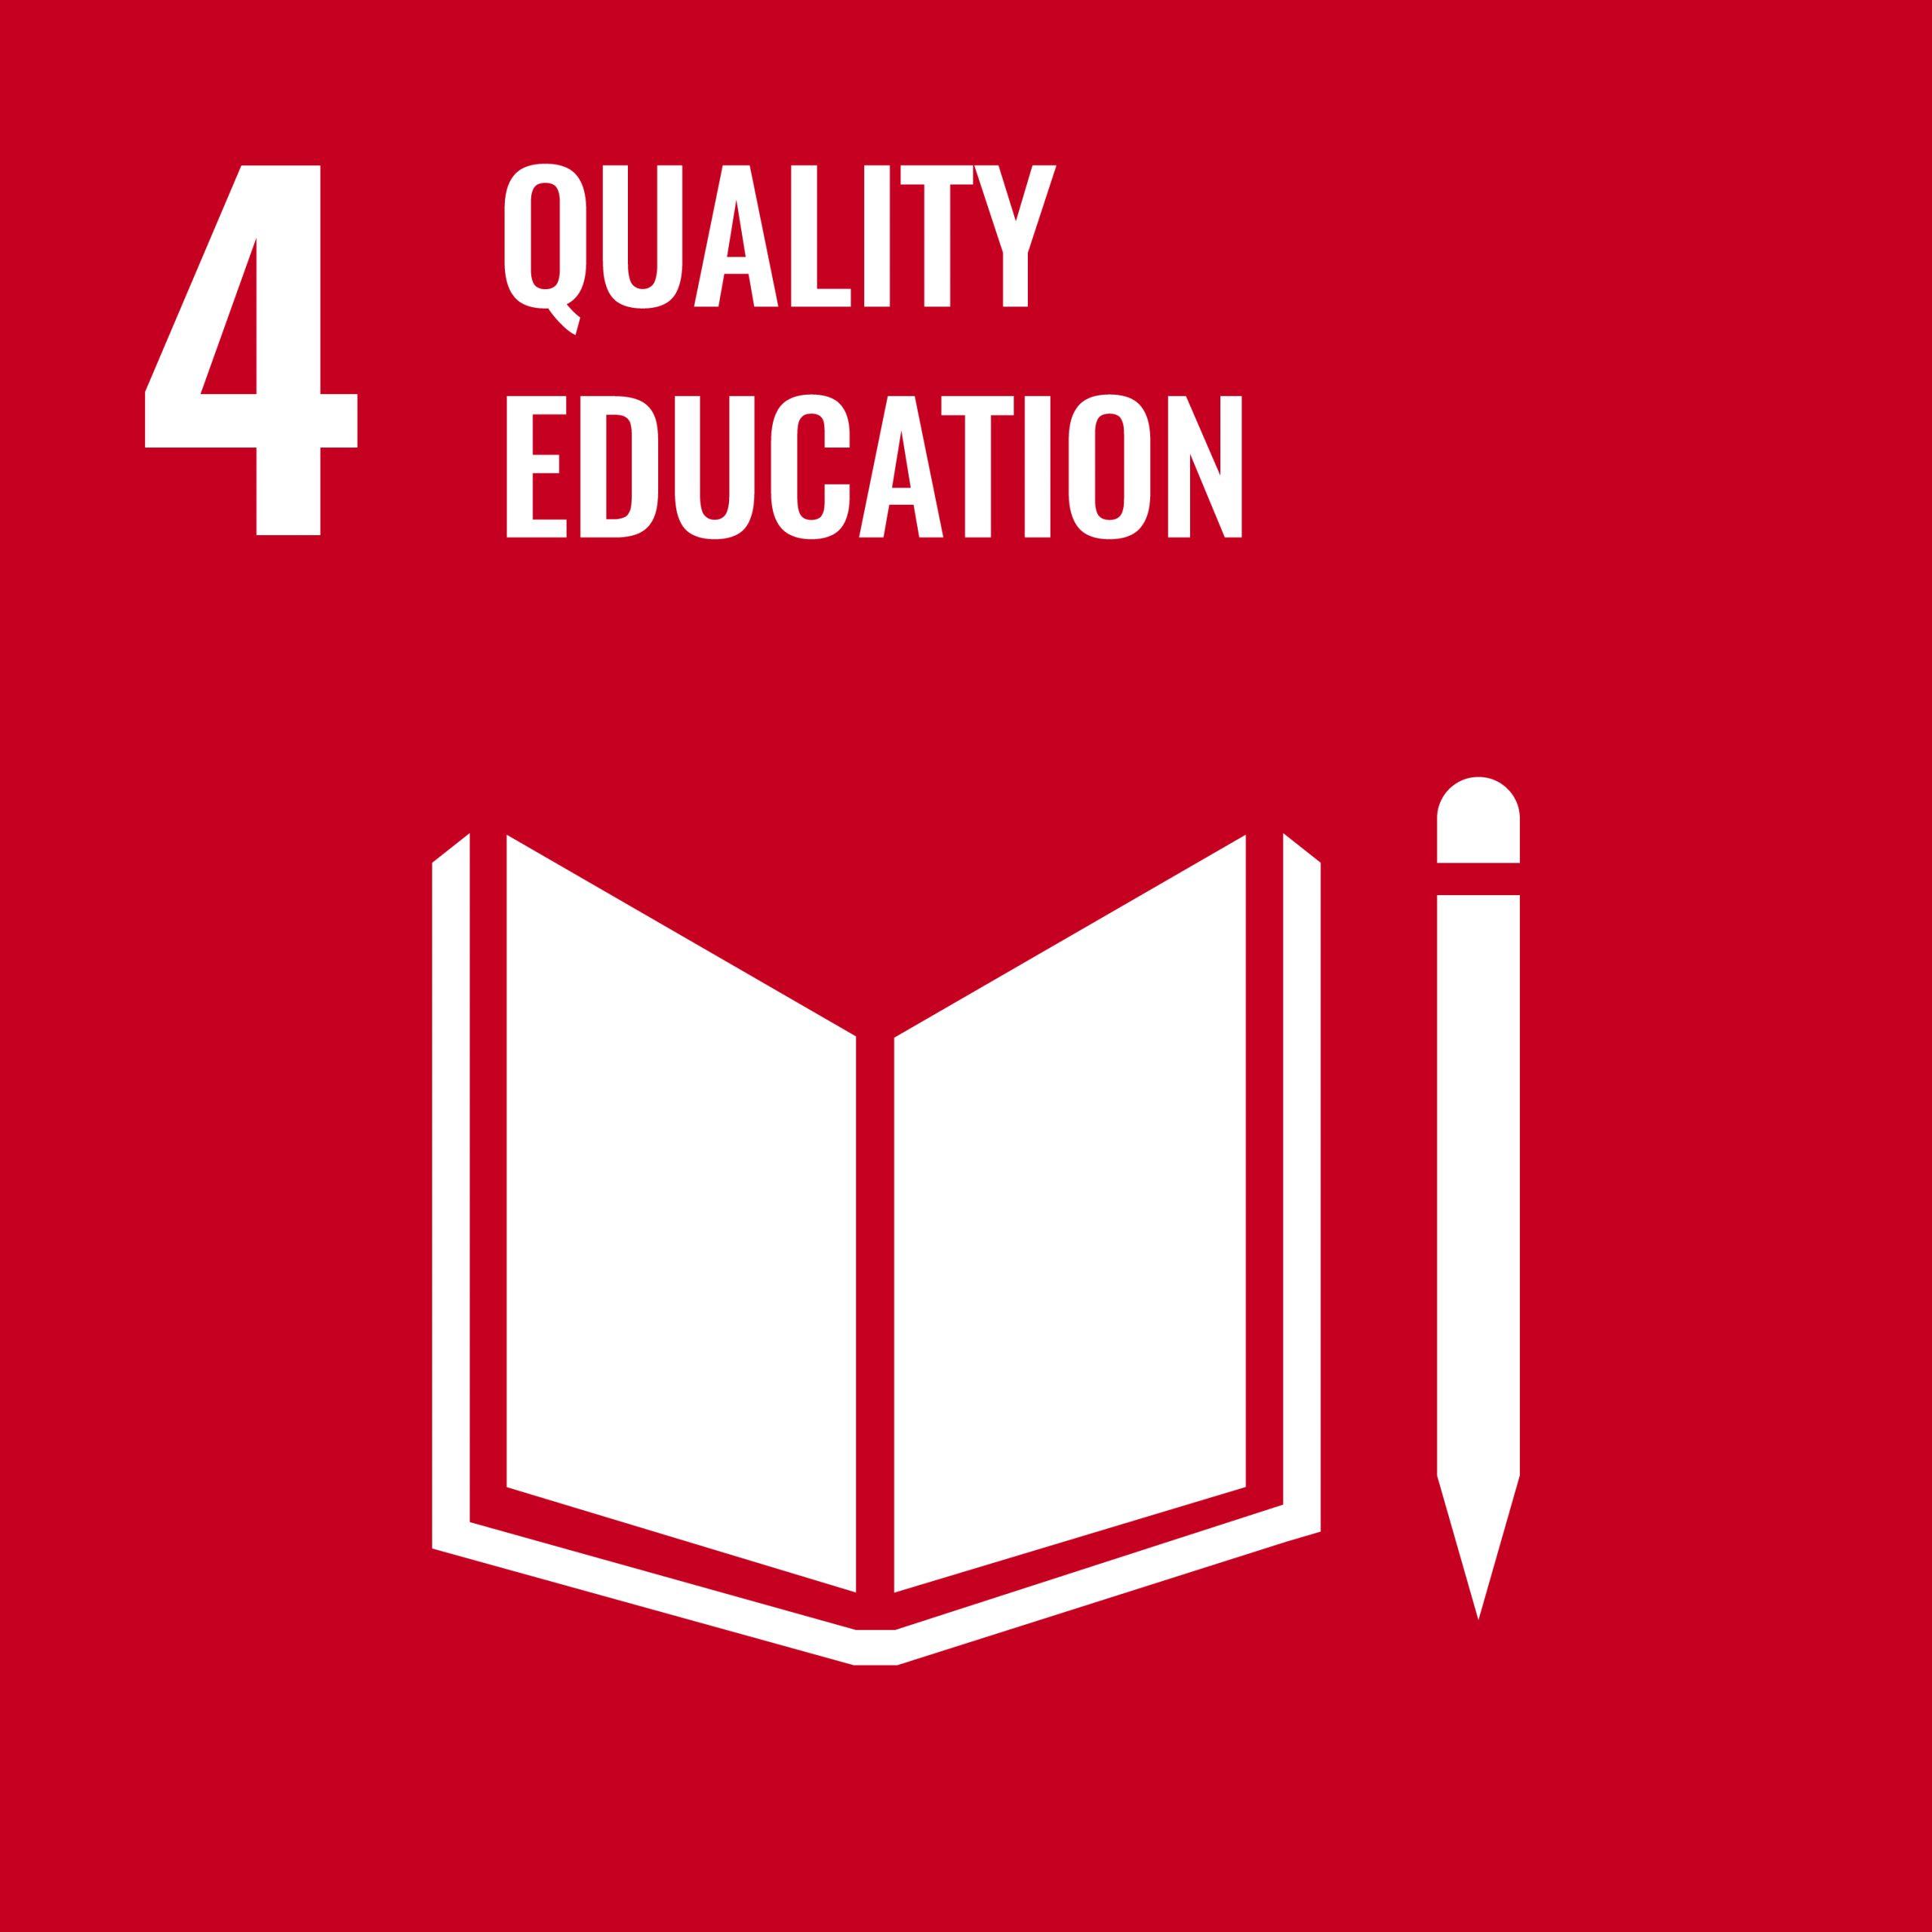 Quality Education - SDG 4